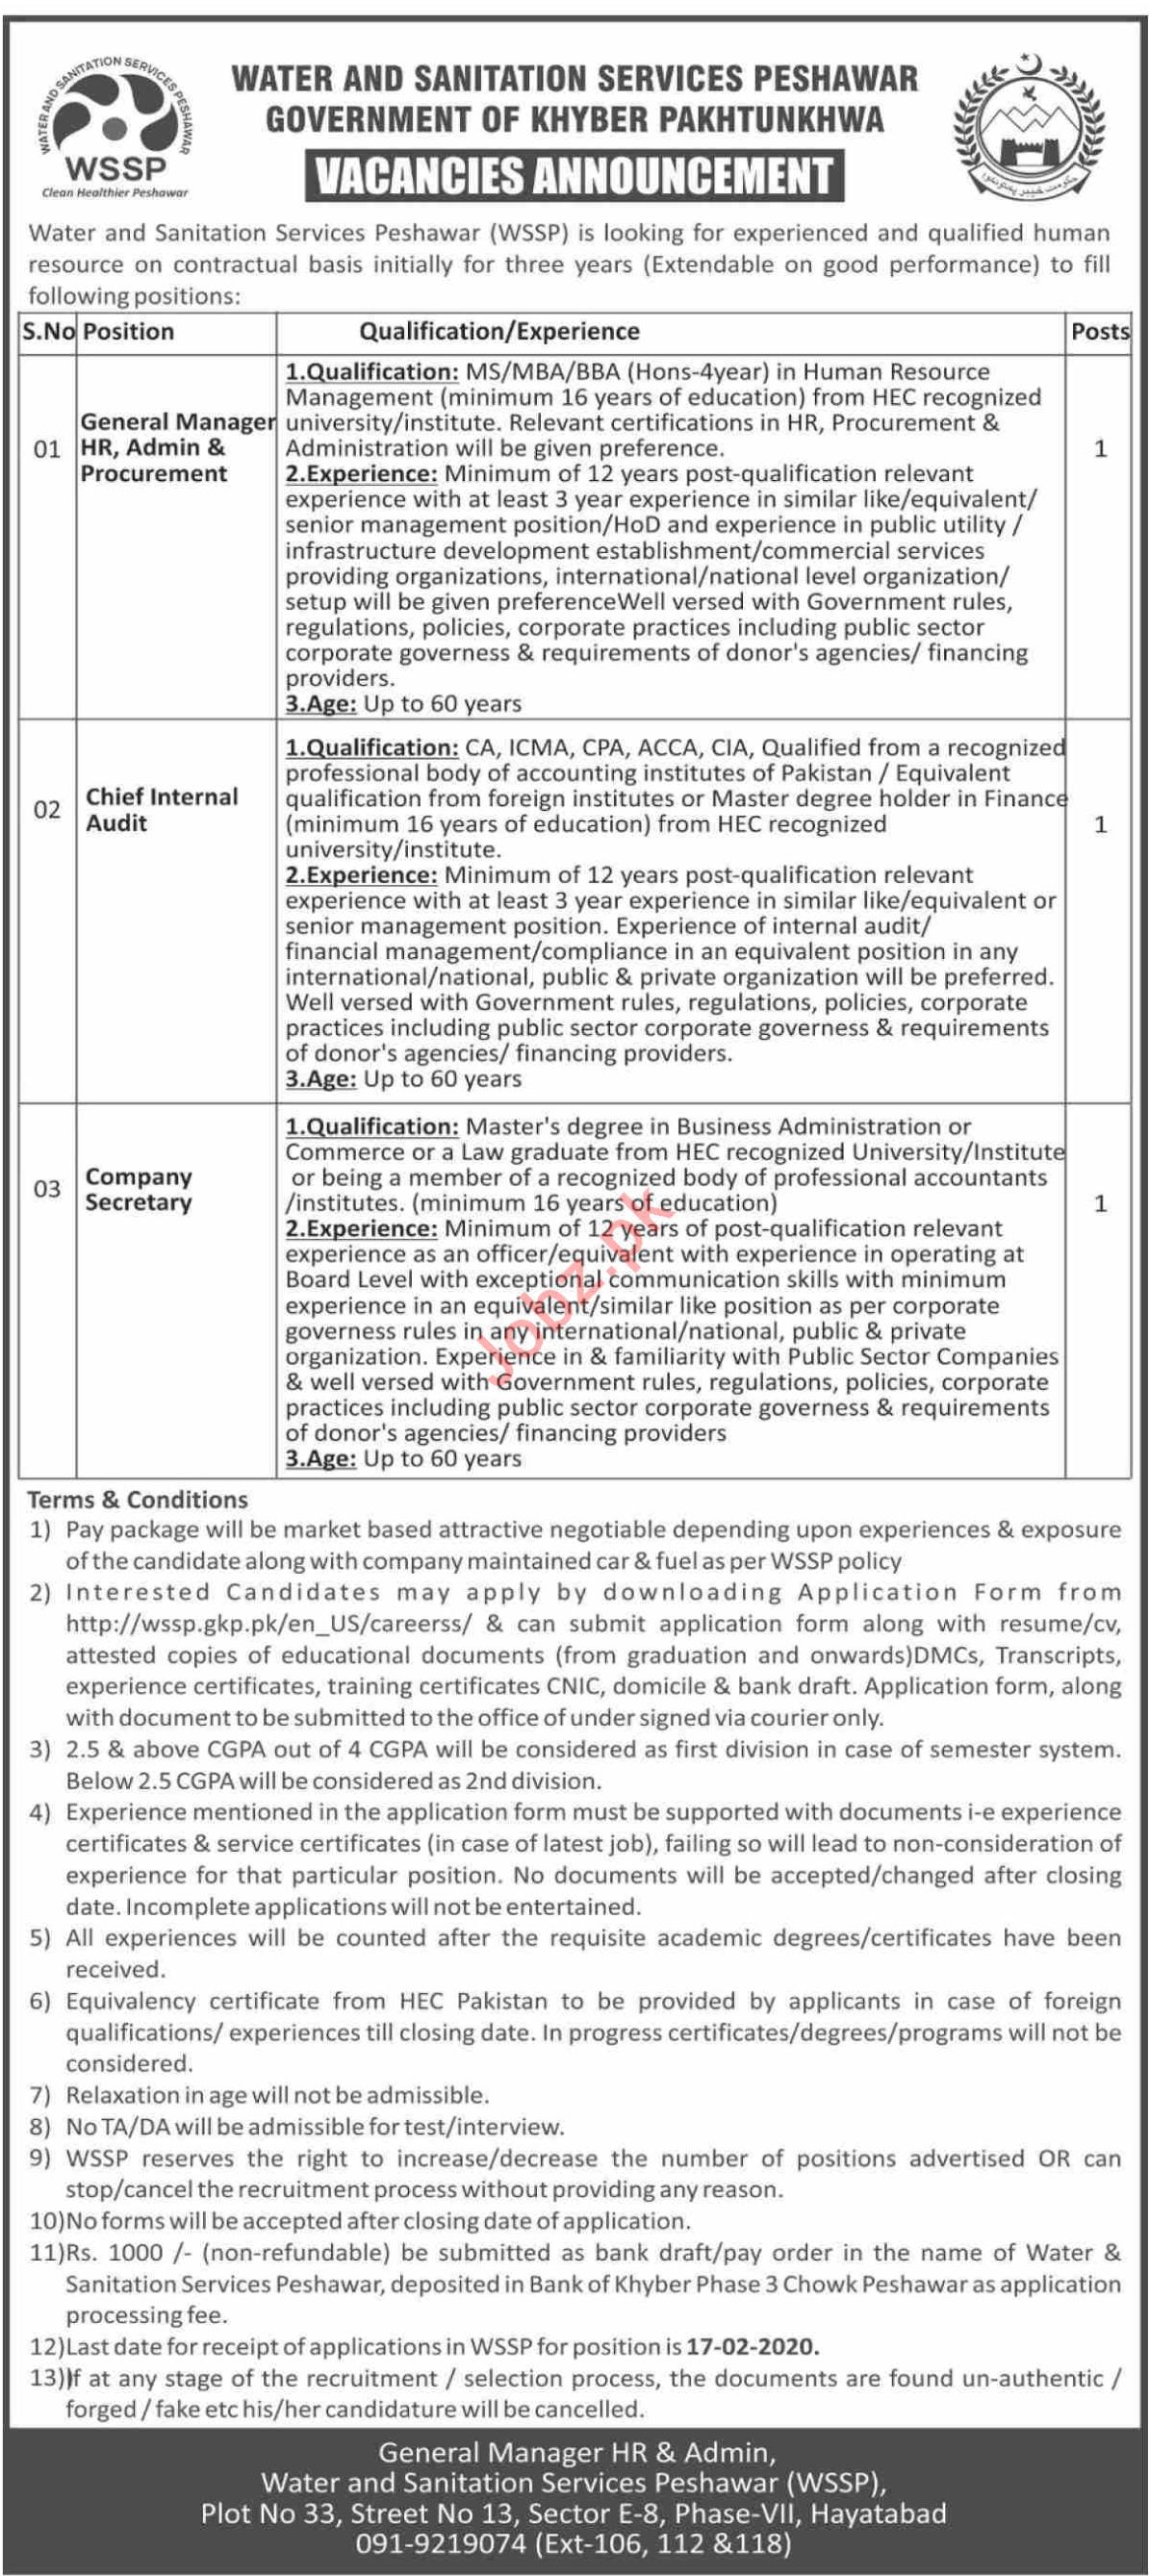 Water & Sanitation Services Peshawar Management Jobs 2020